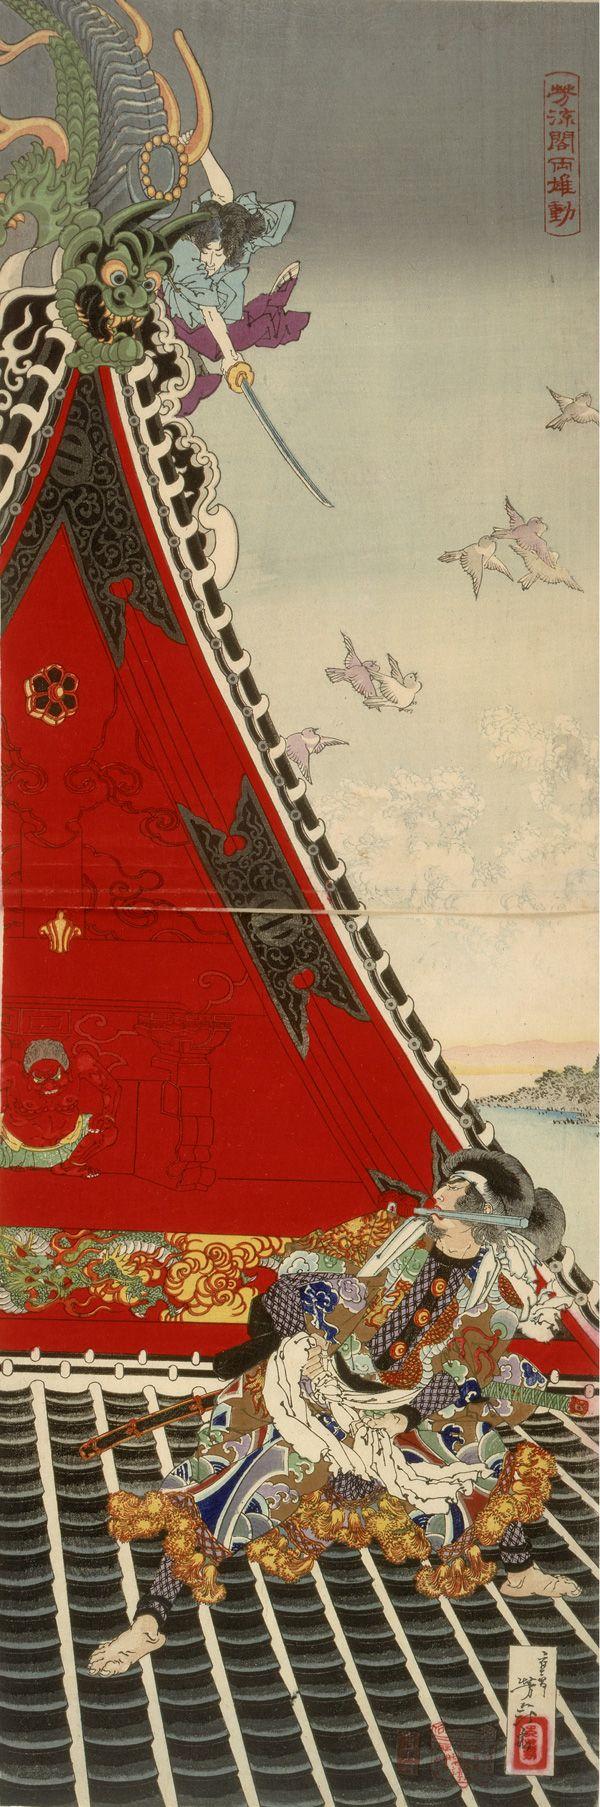 Japanese Art | Two Heroes in Battle at Horyukaku | S2004.3.317a-b